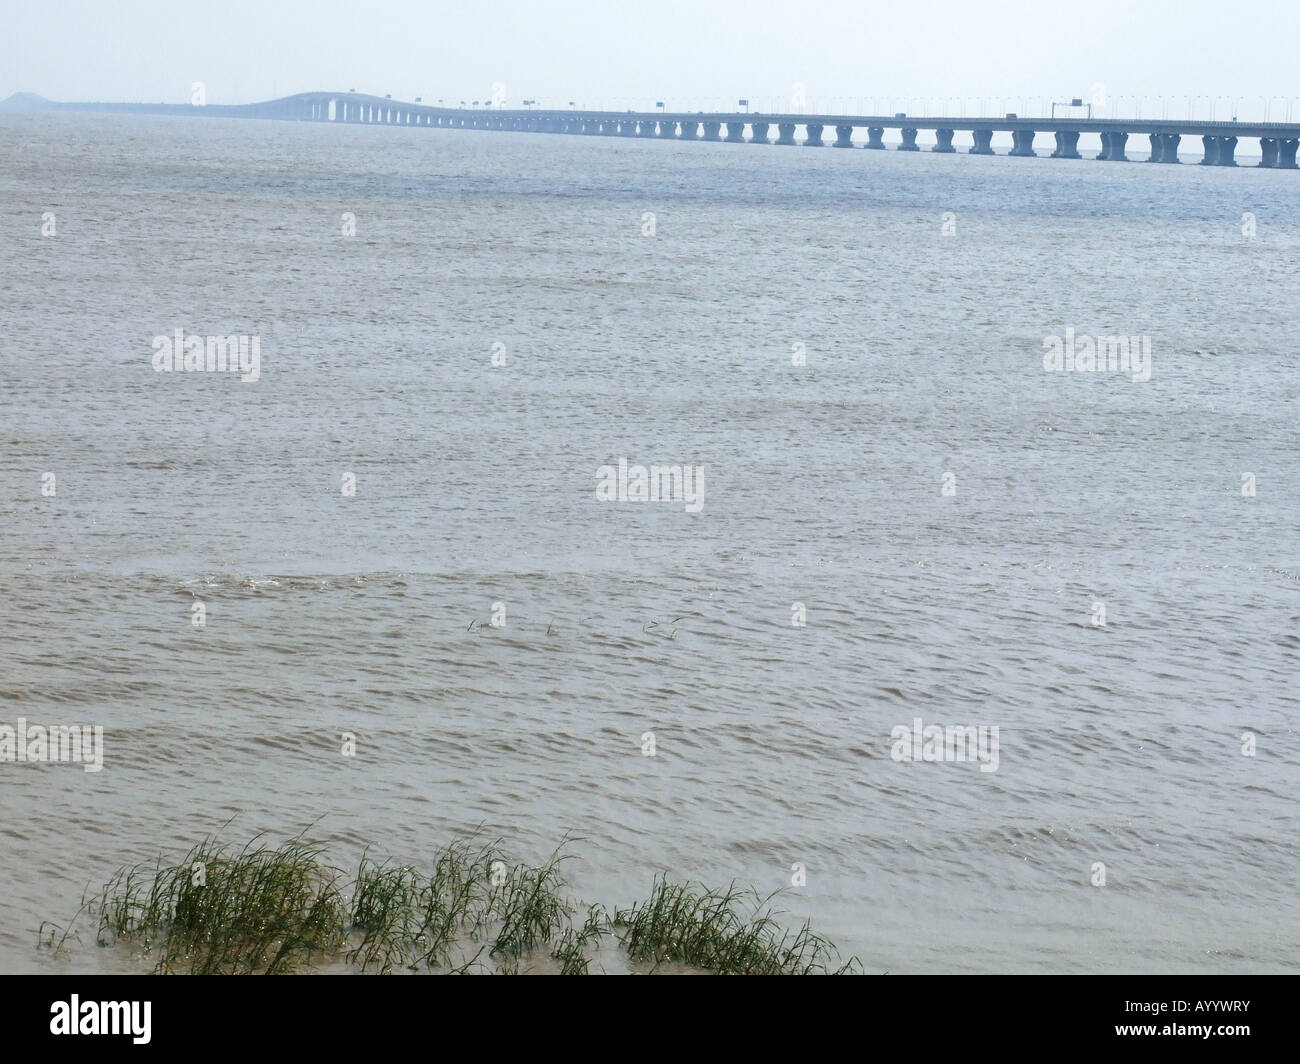 View of Donghai Bridge as seen from Lingang New City near Shanghai China Stock Photo